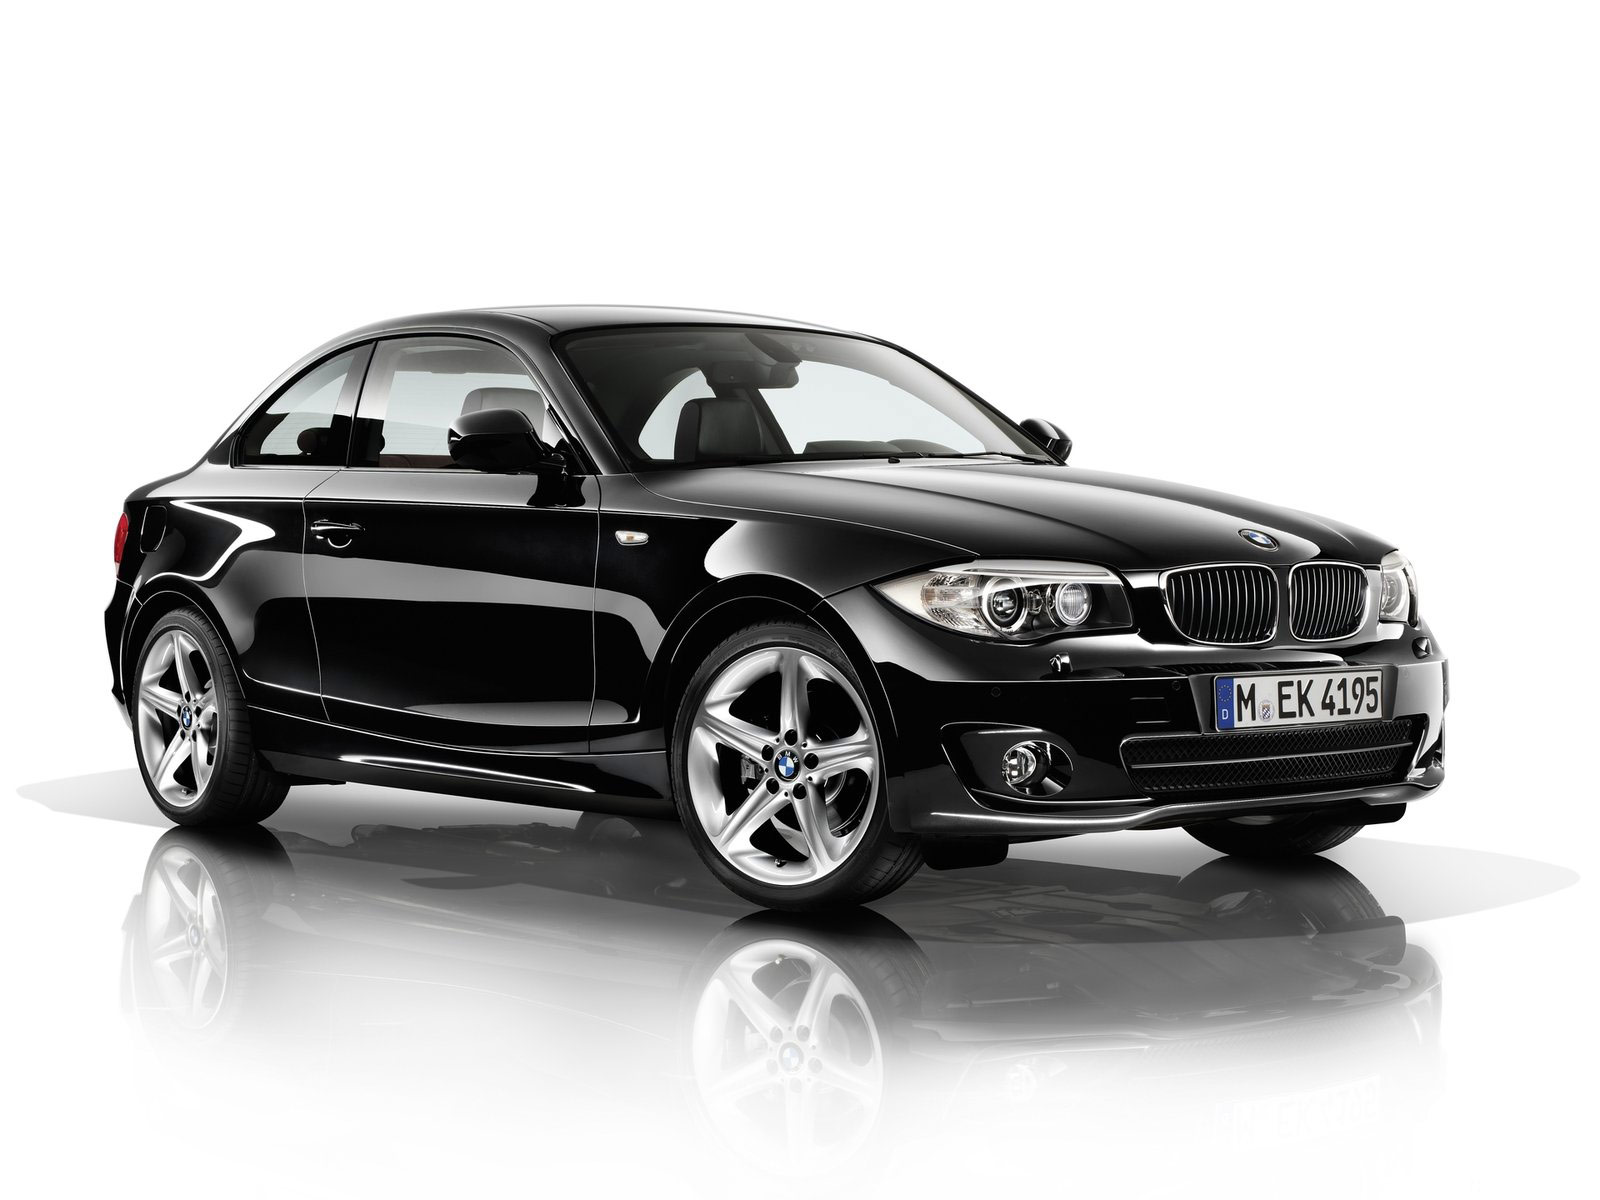 2012 bmw 1 series coupe bmw automotive. Black Bedroom Furniture Sets. Home Design Ideas